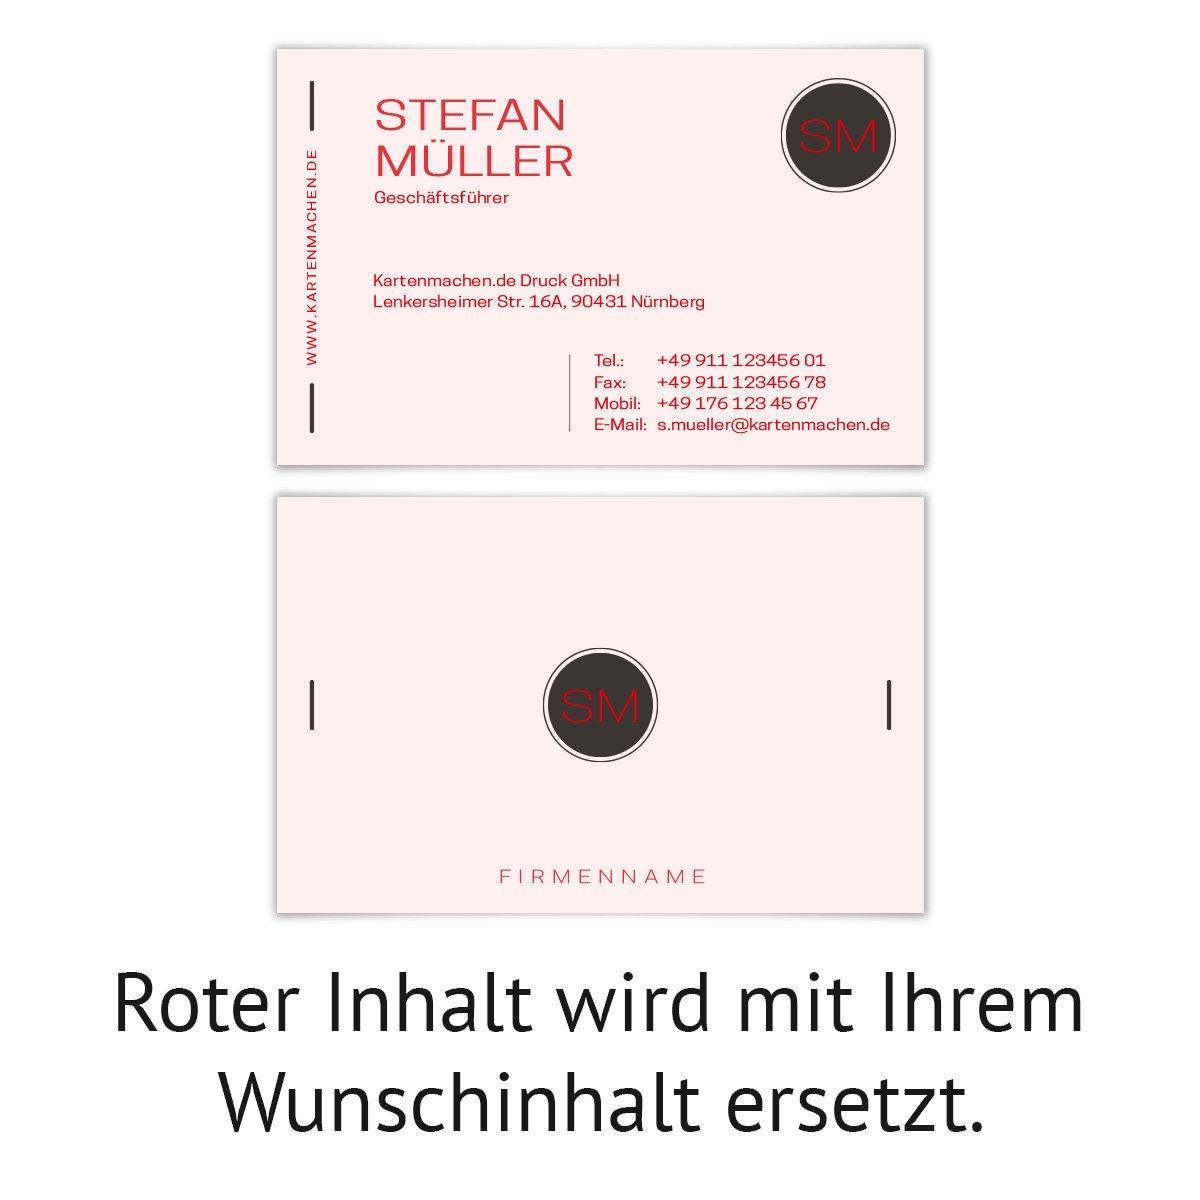 500 x Visitenkarten individuell Business Karten 300g qm 85 x x x 55 mm - Modern Minimal B07F7C7PHQ Postkarten Günstiger 2416cc